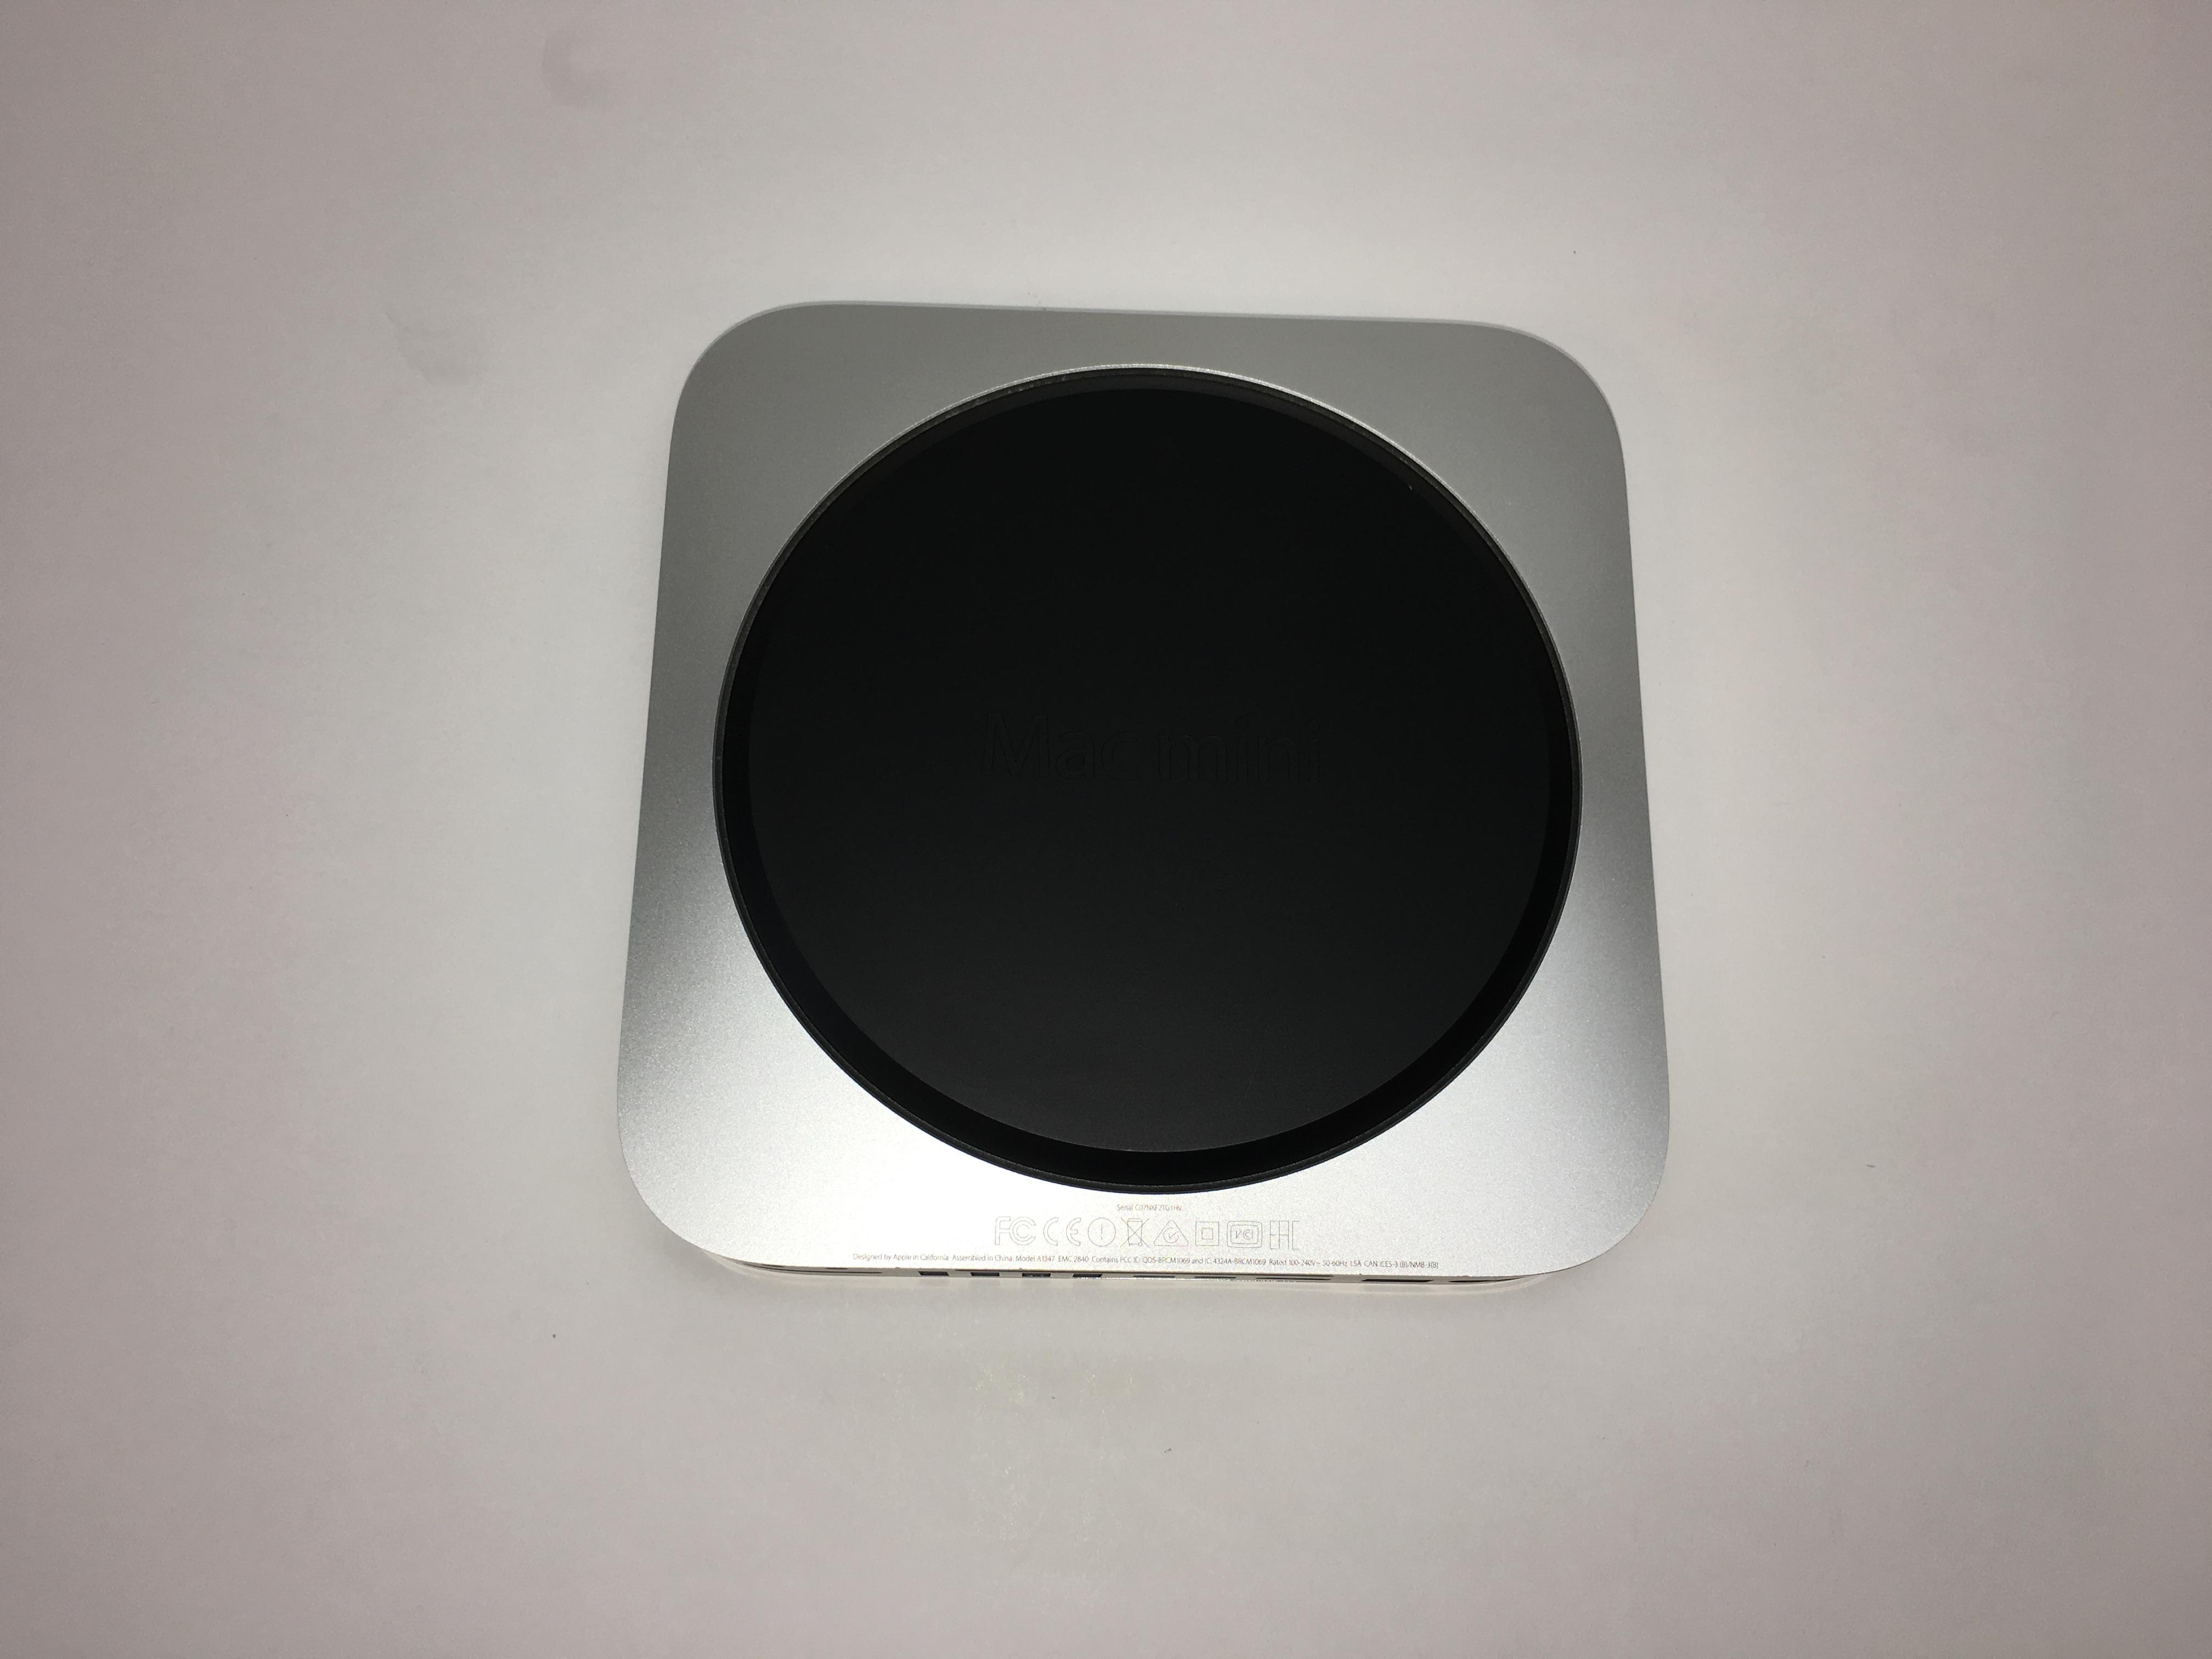 Mac mini, 1.4 GHz Intel Core i5, 4 GB 1600 MHz DDR3, 500 GB SATA Disk, Product age: 38 months, image 3